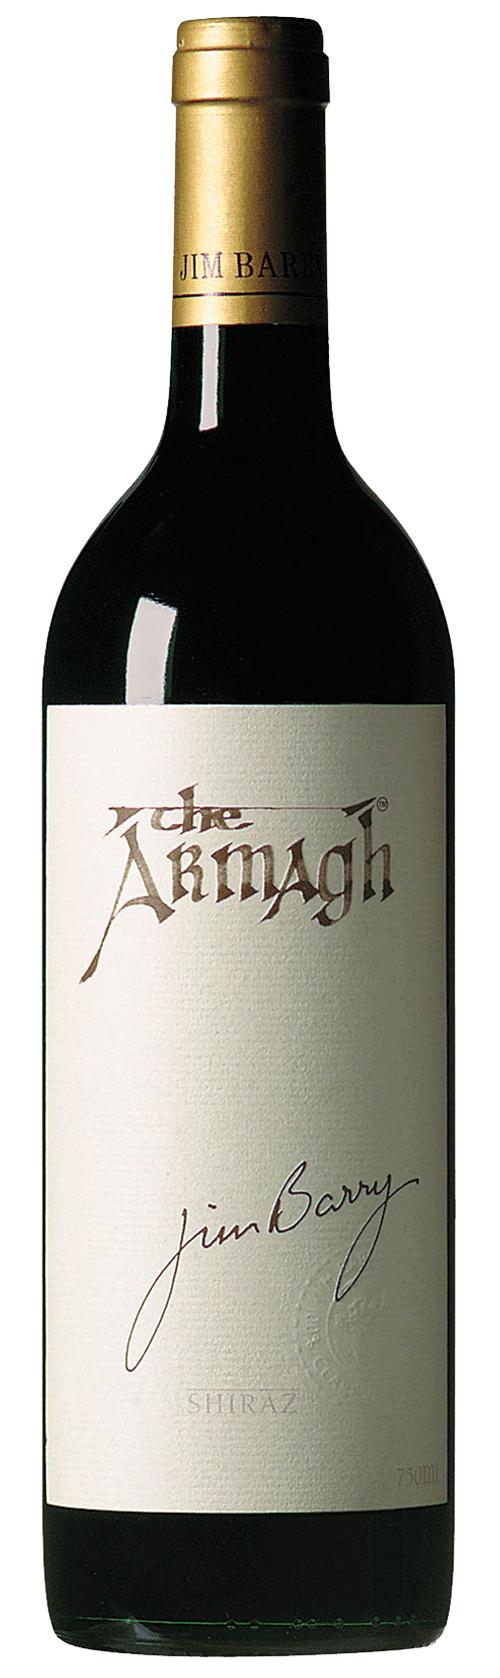 The Armagh Shiraz 2006